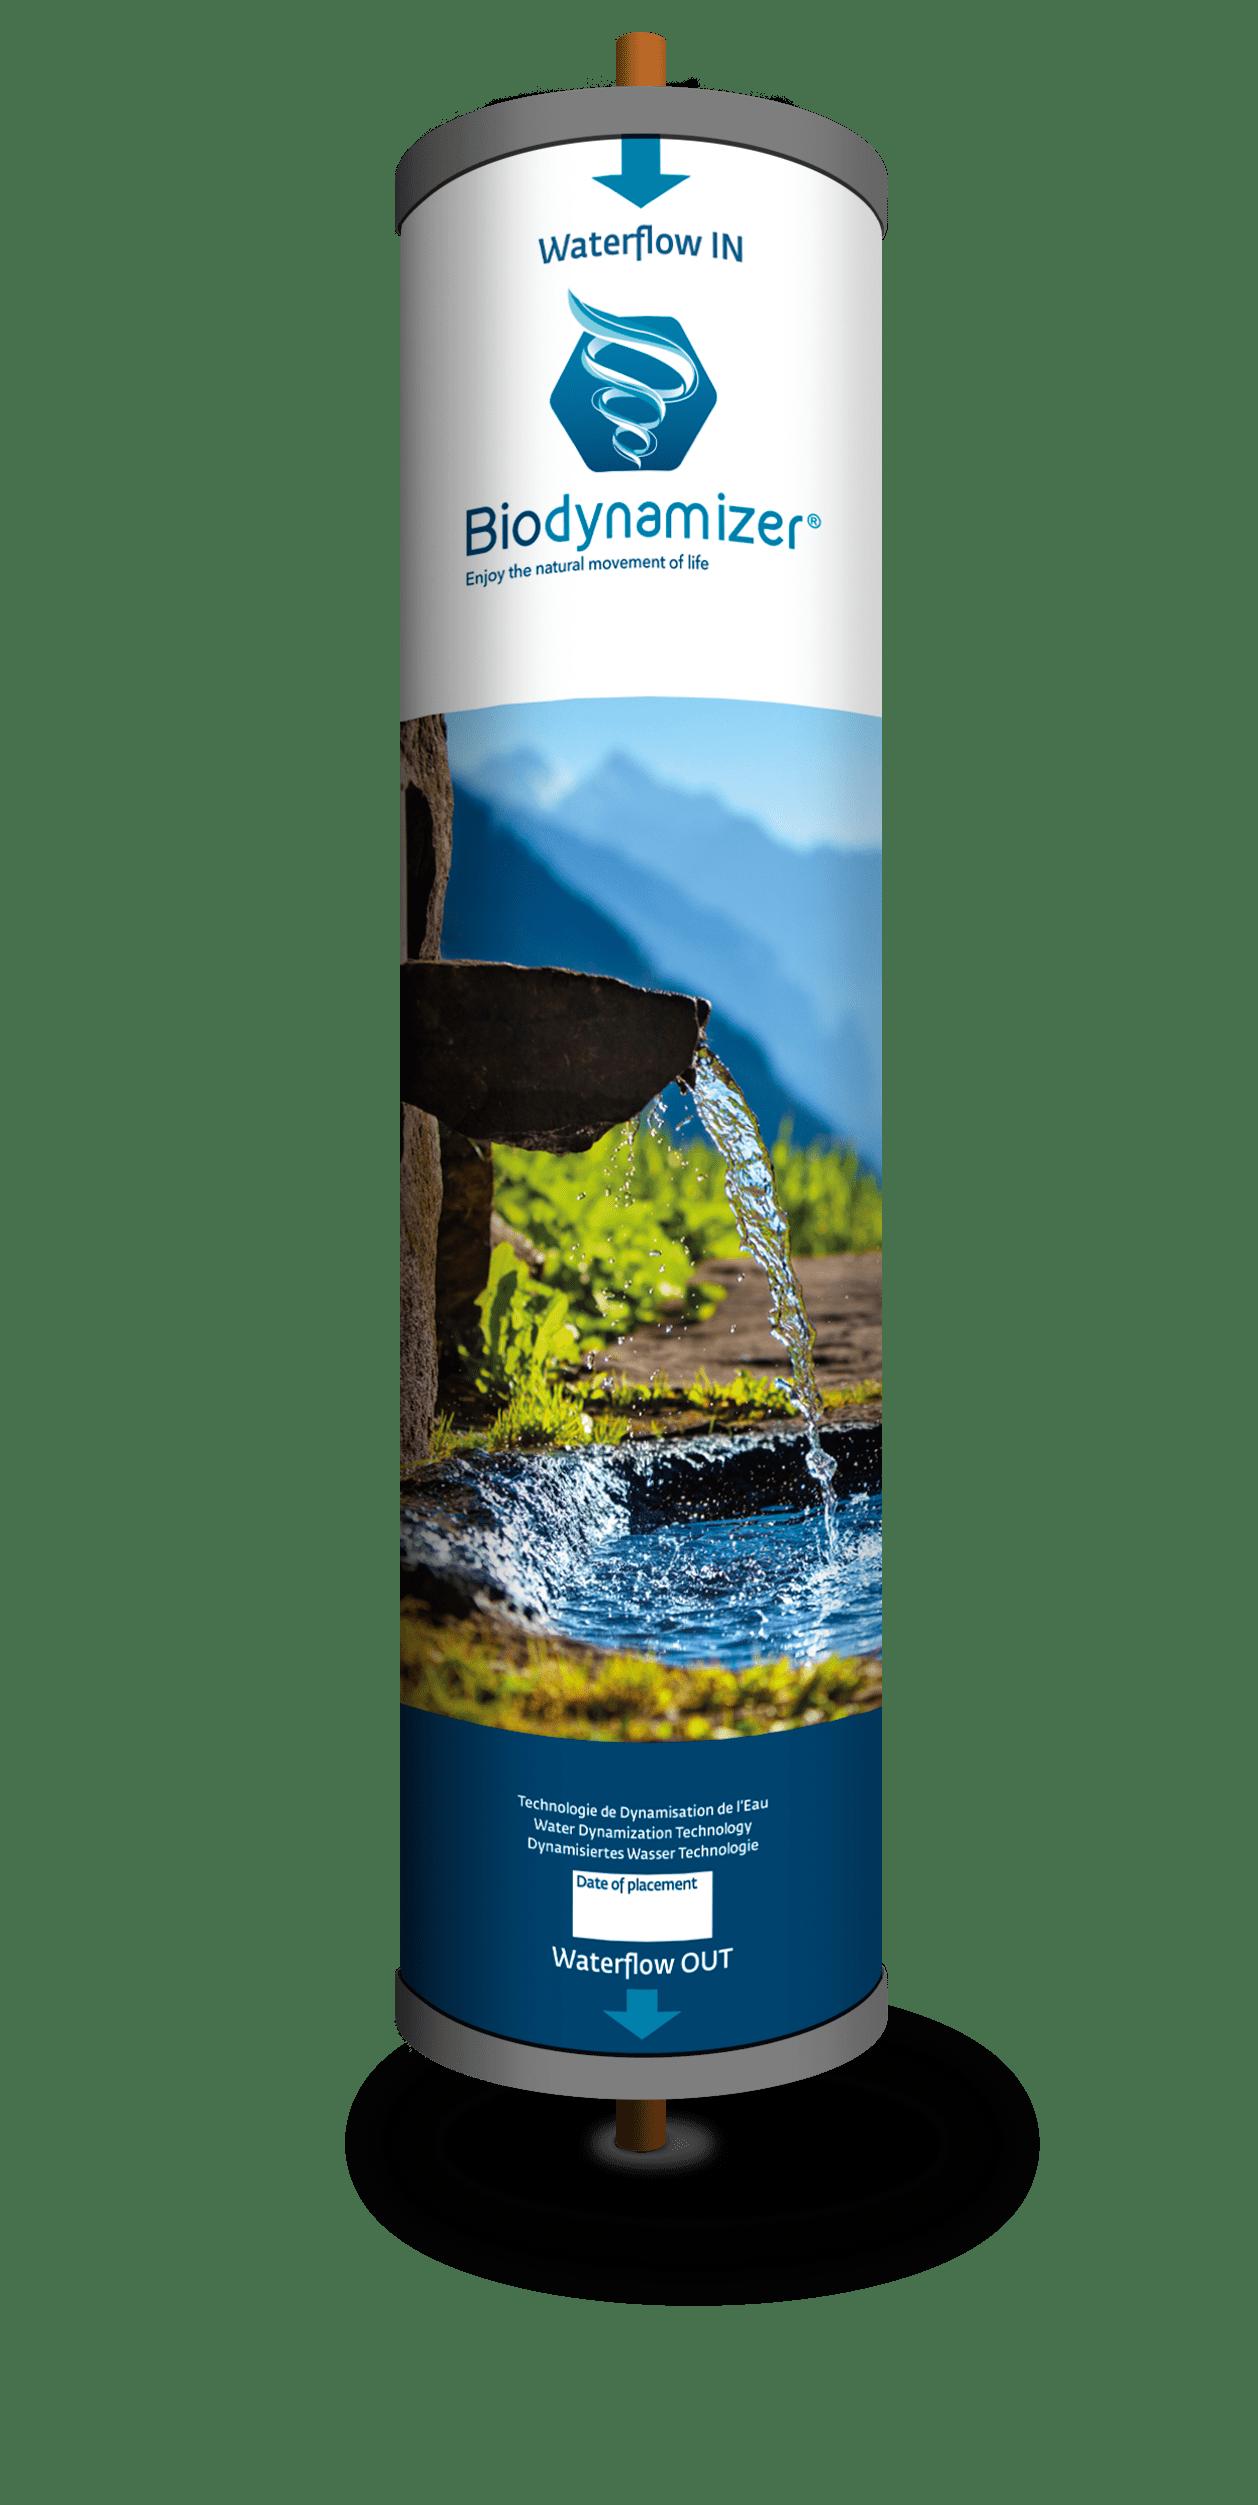 Biodynamizer dynamisation de l'eau du robinet